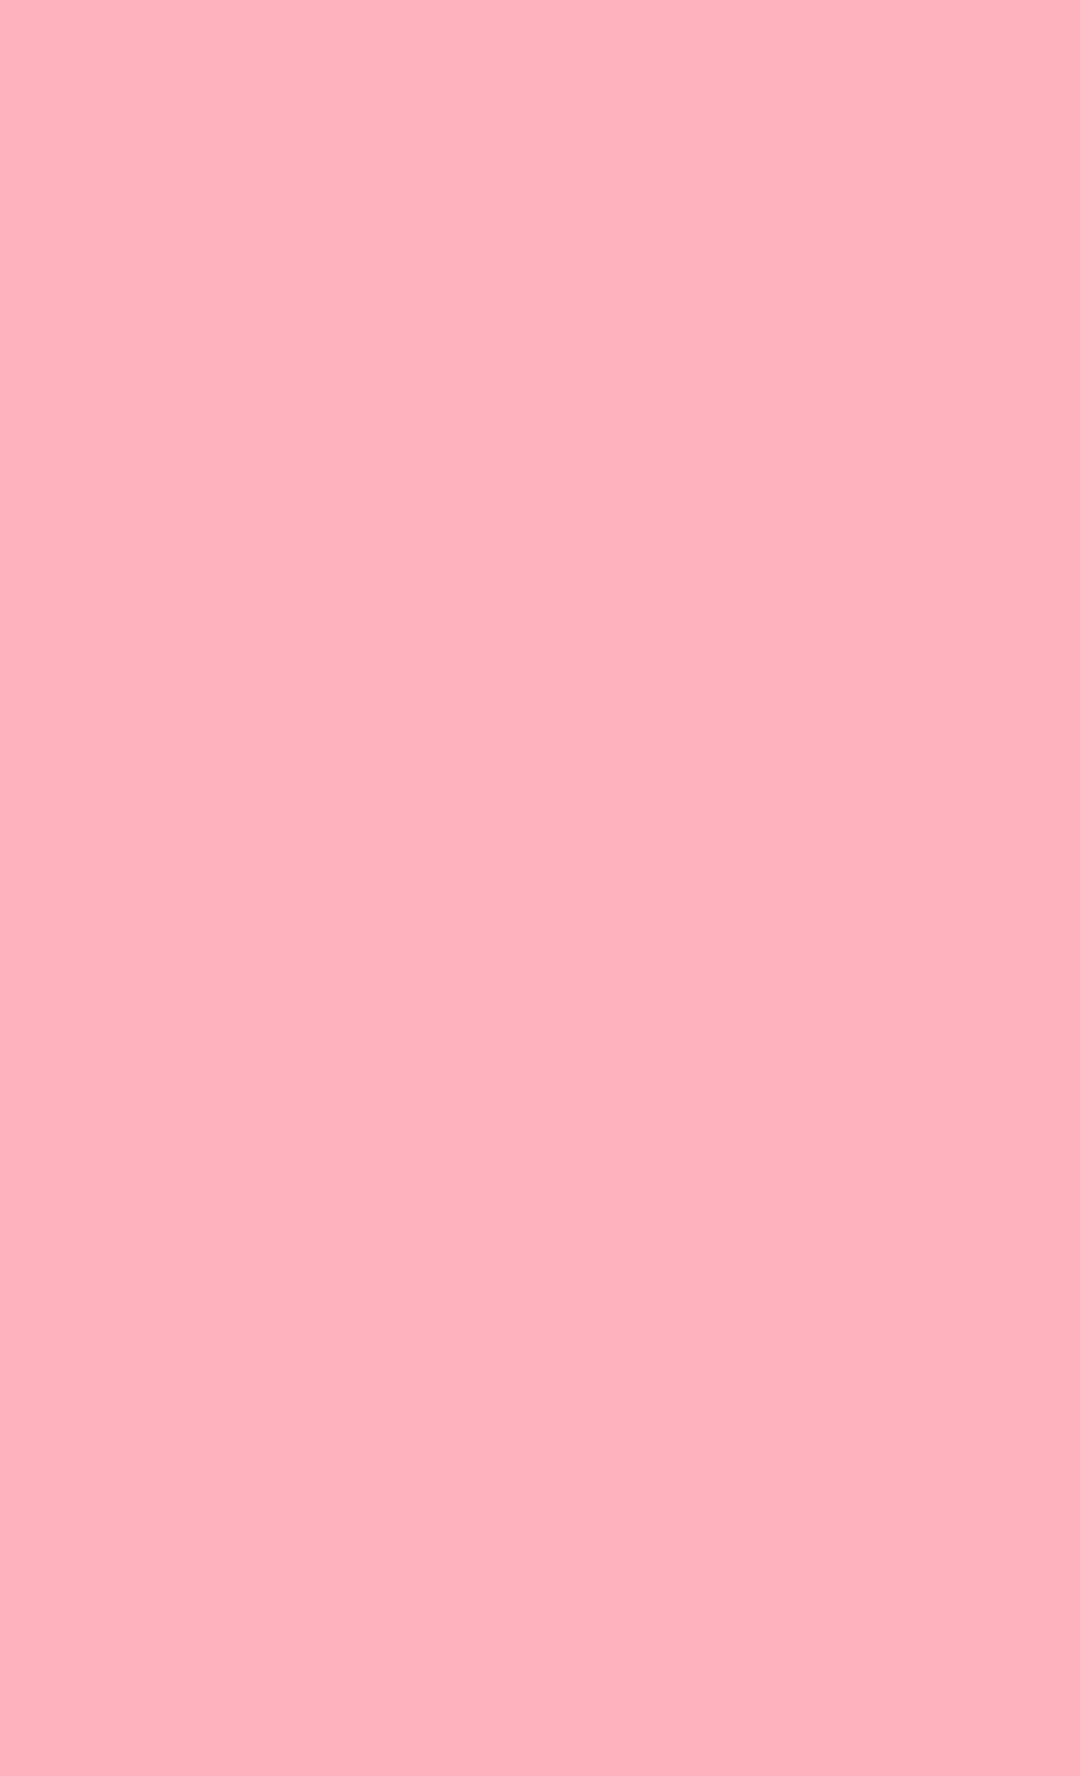 Pin oleh Shifa bilal di solid colour | Papan warna, Palet warna, Warna